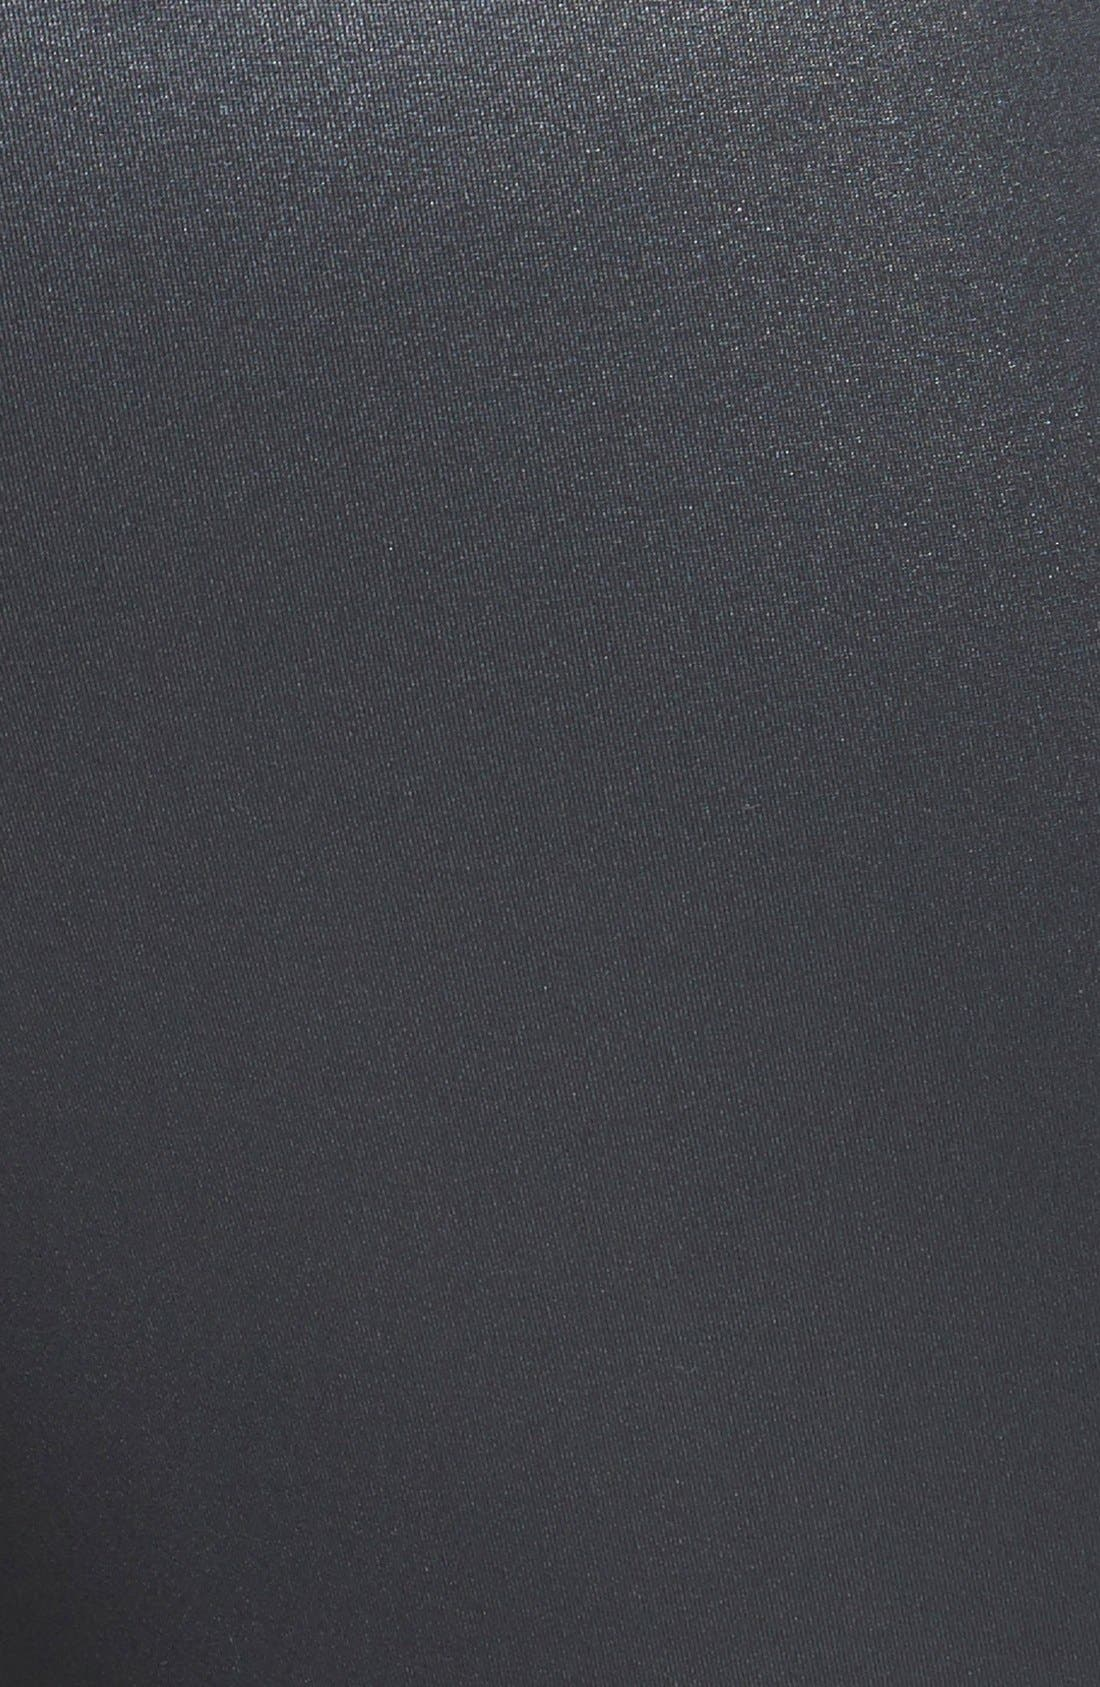 Alternate Image 3  - adidas by Stella McCartney Running Tights